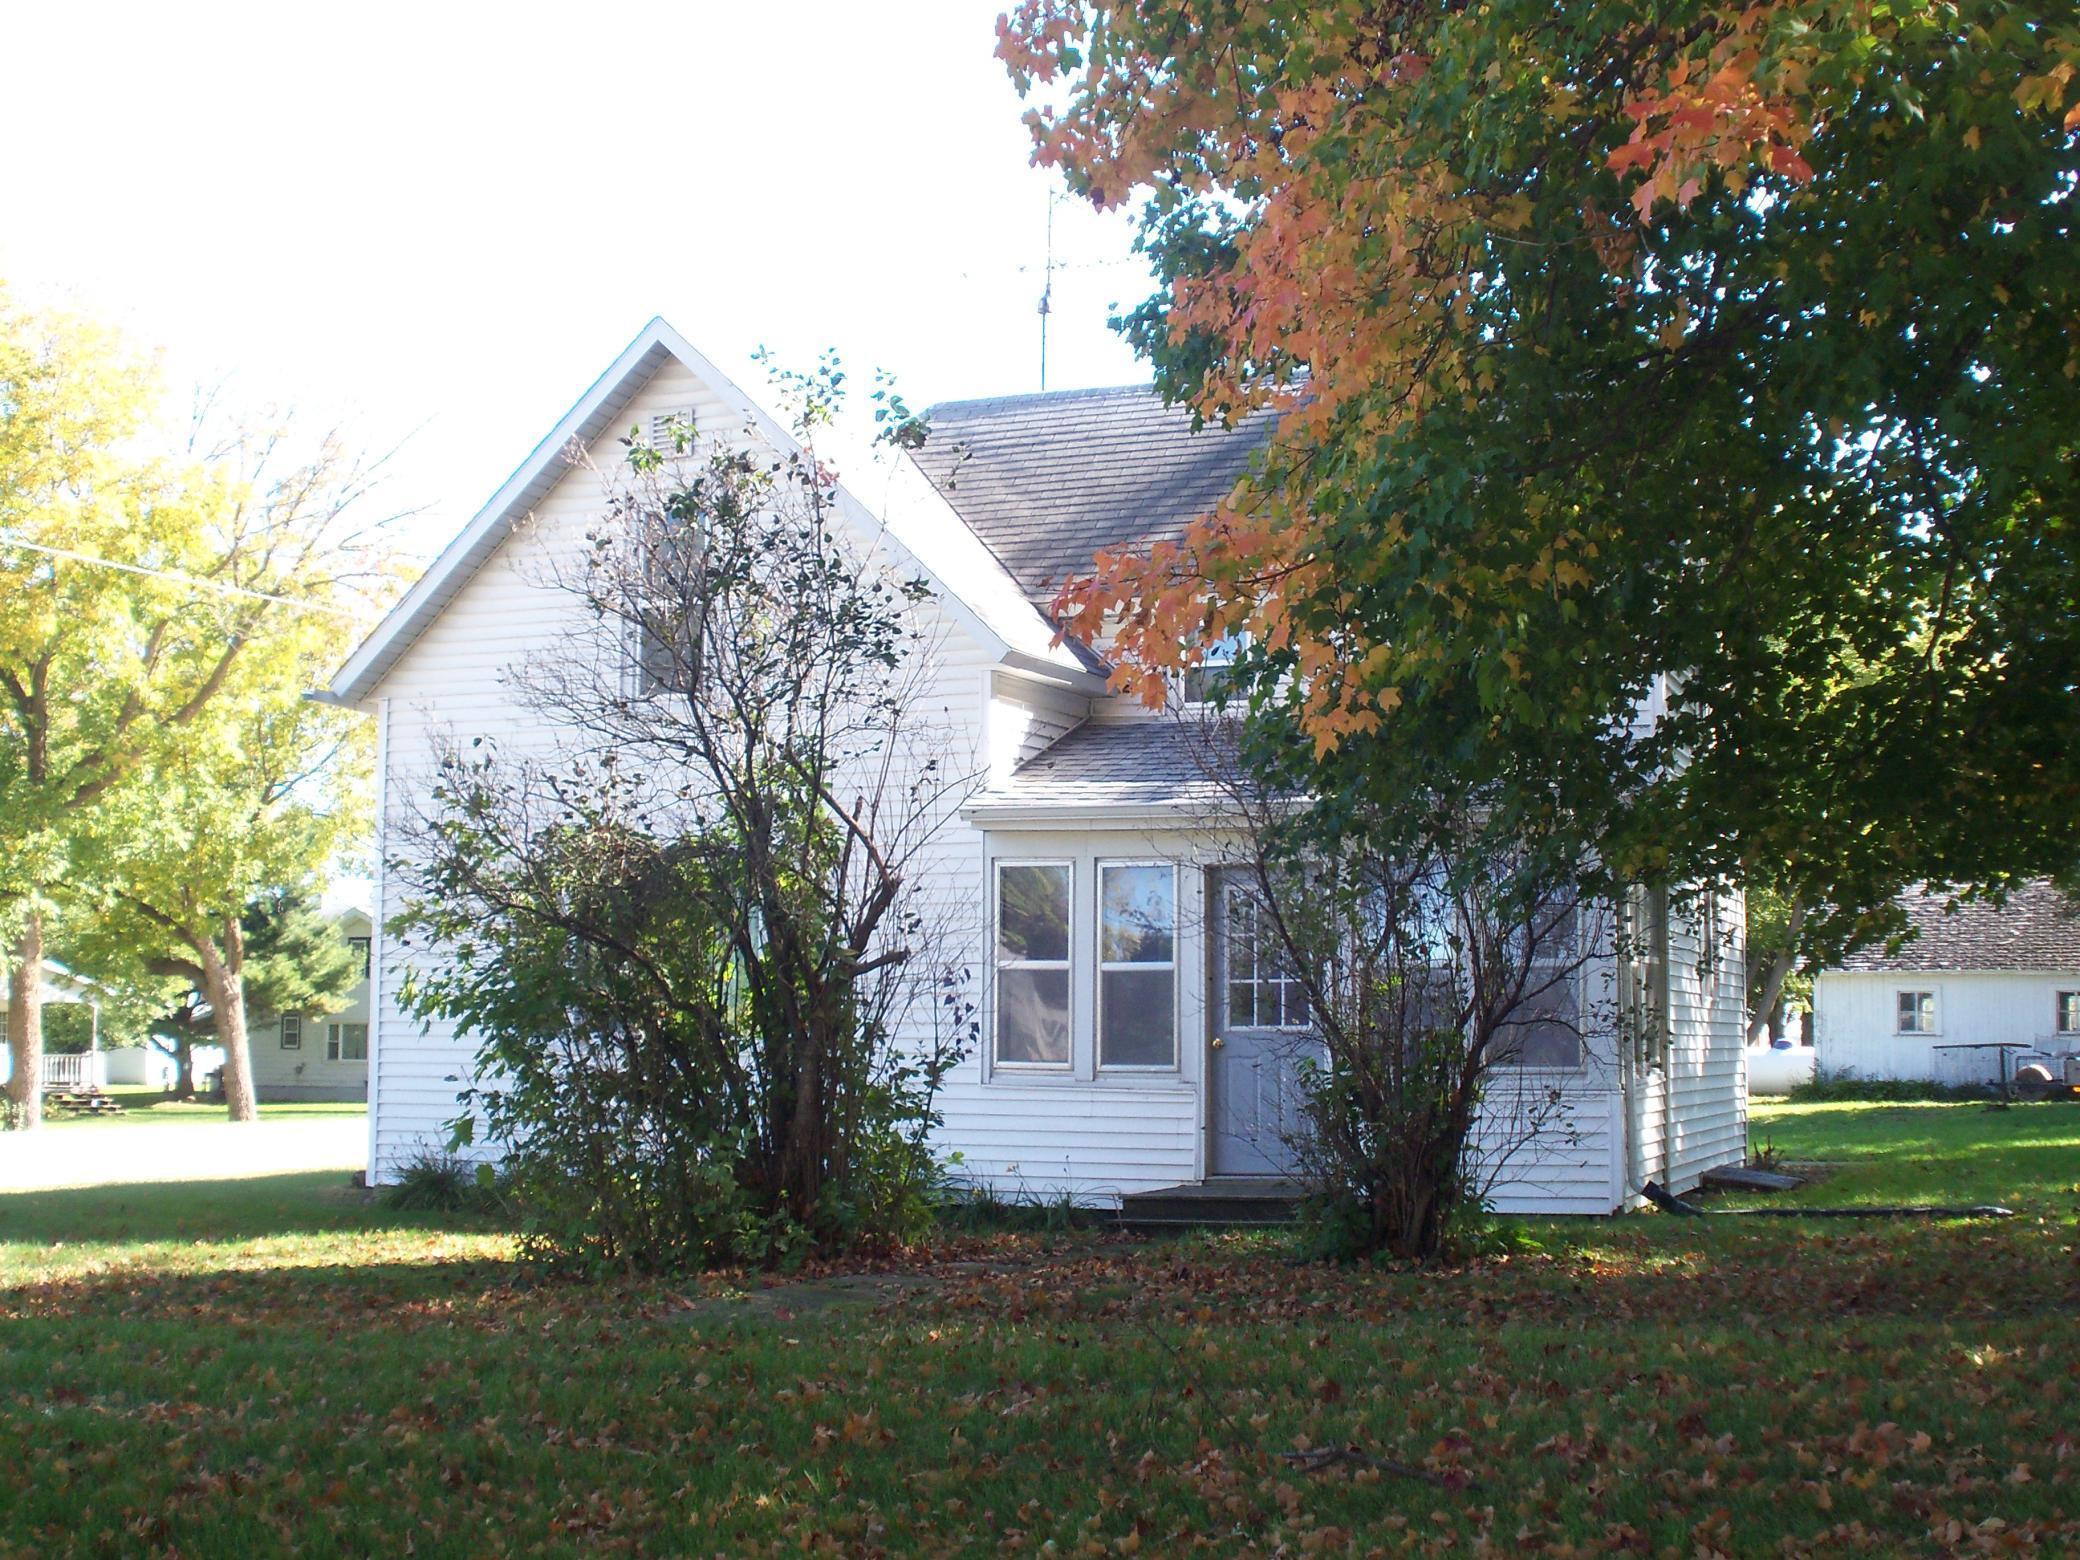 101 Minnesota Street, Ostrander, MN 55961